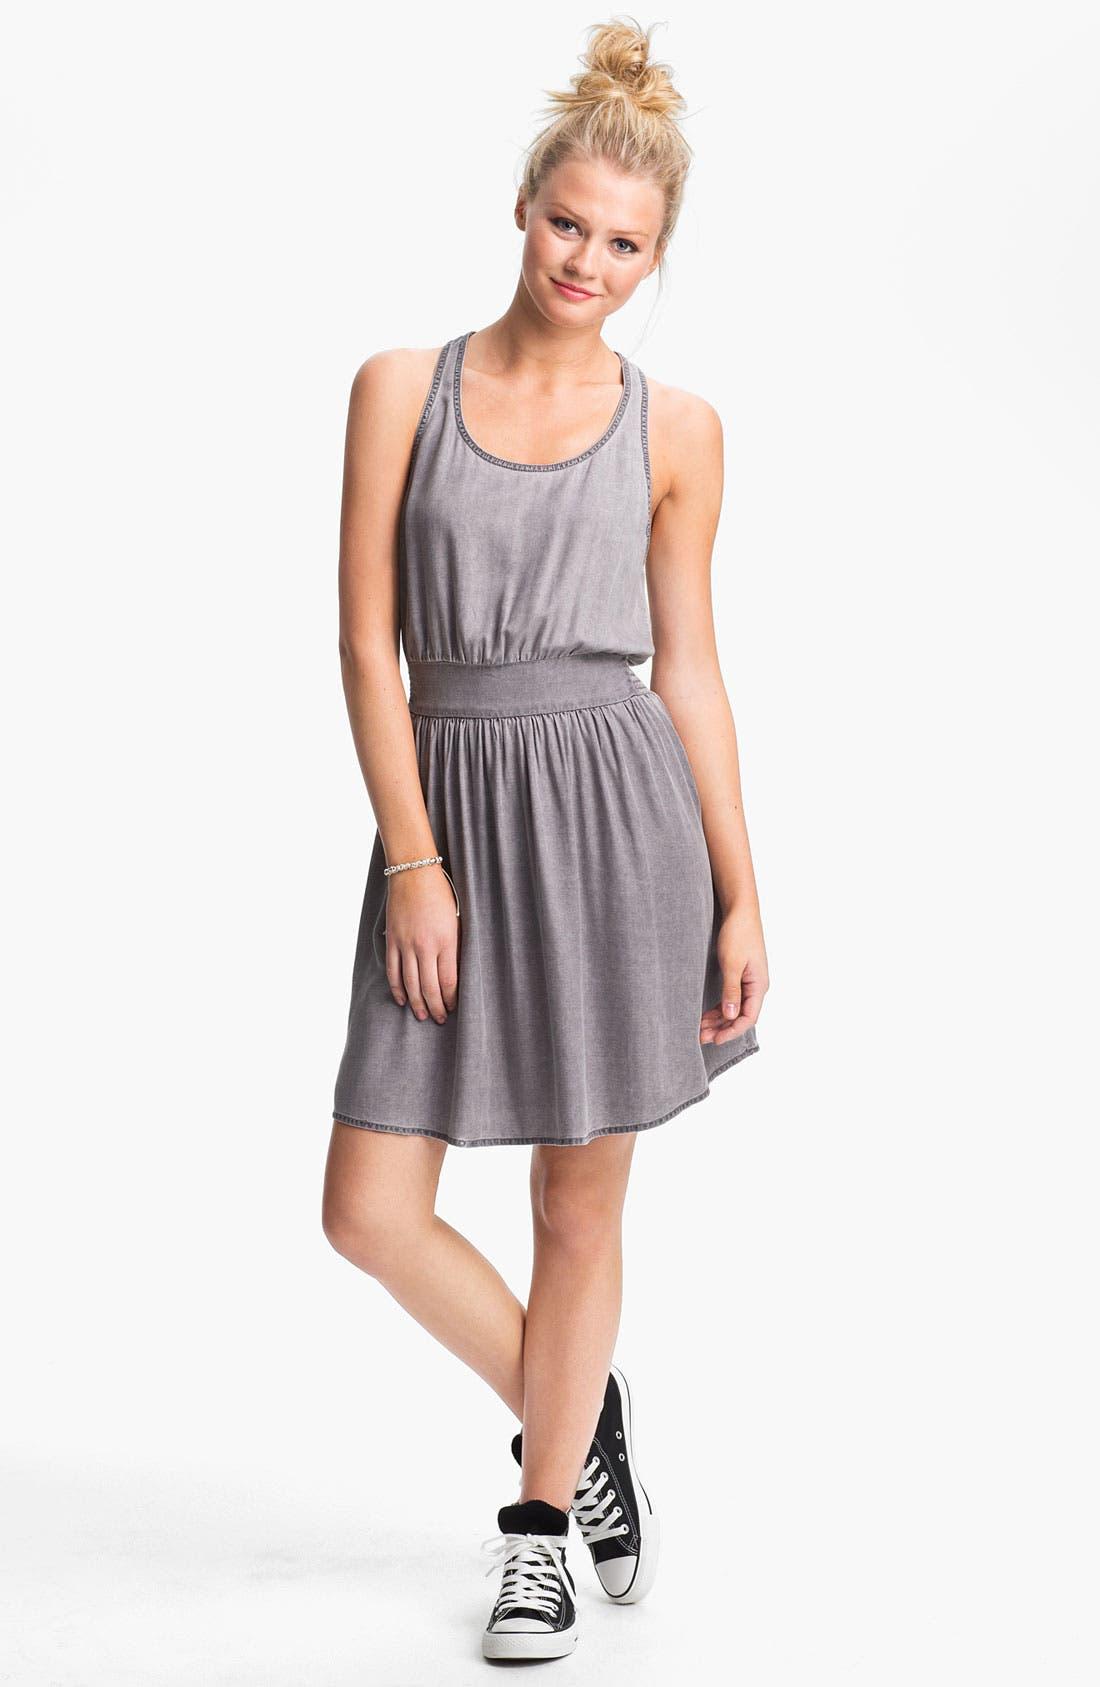 Alternate Image 1 Selected - BP. Chambray Racerback Dress (Juniors)